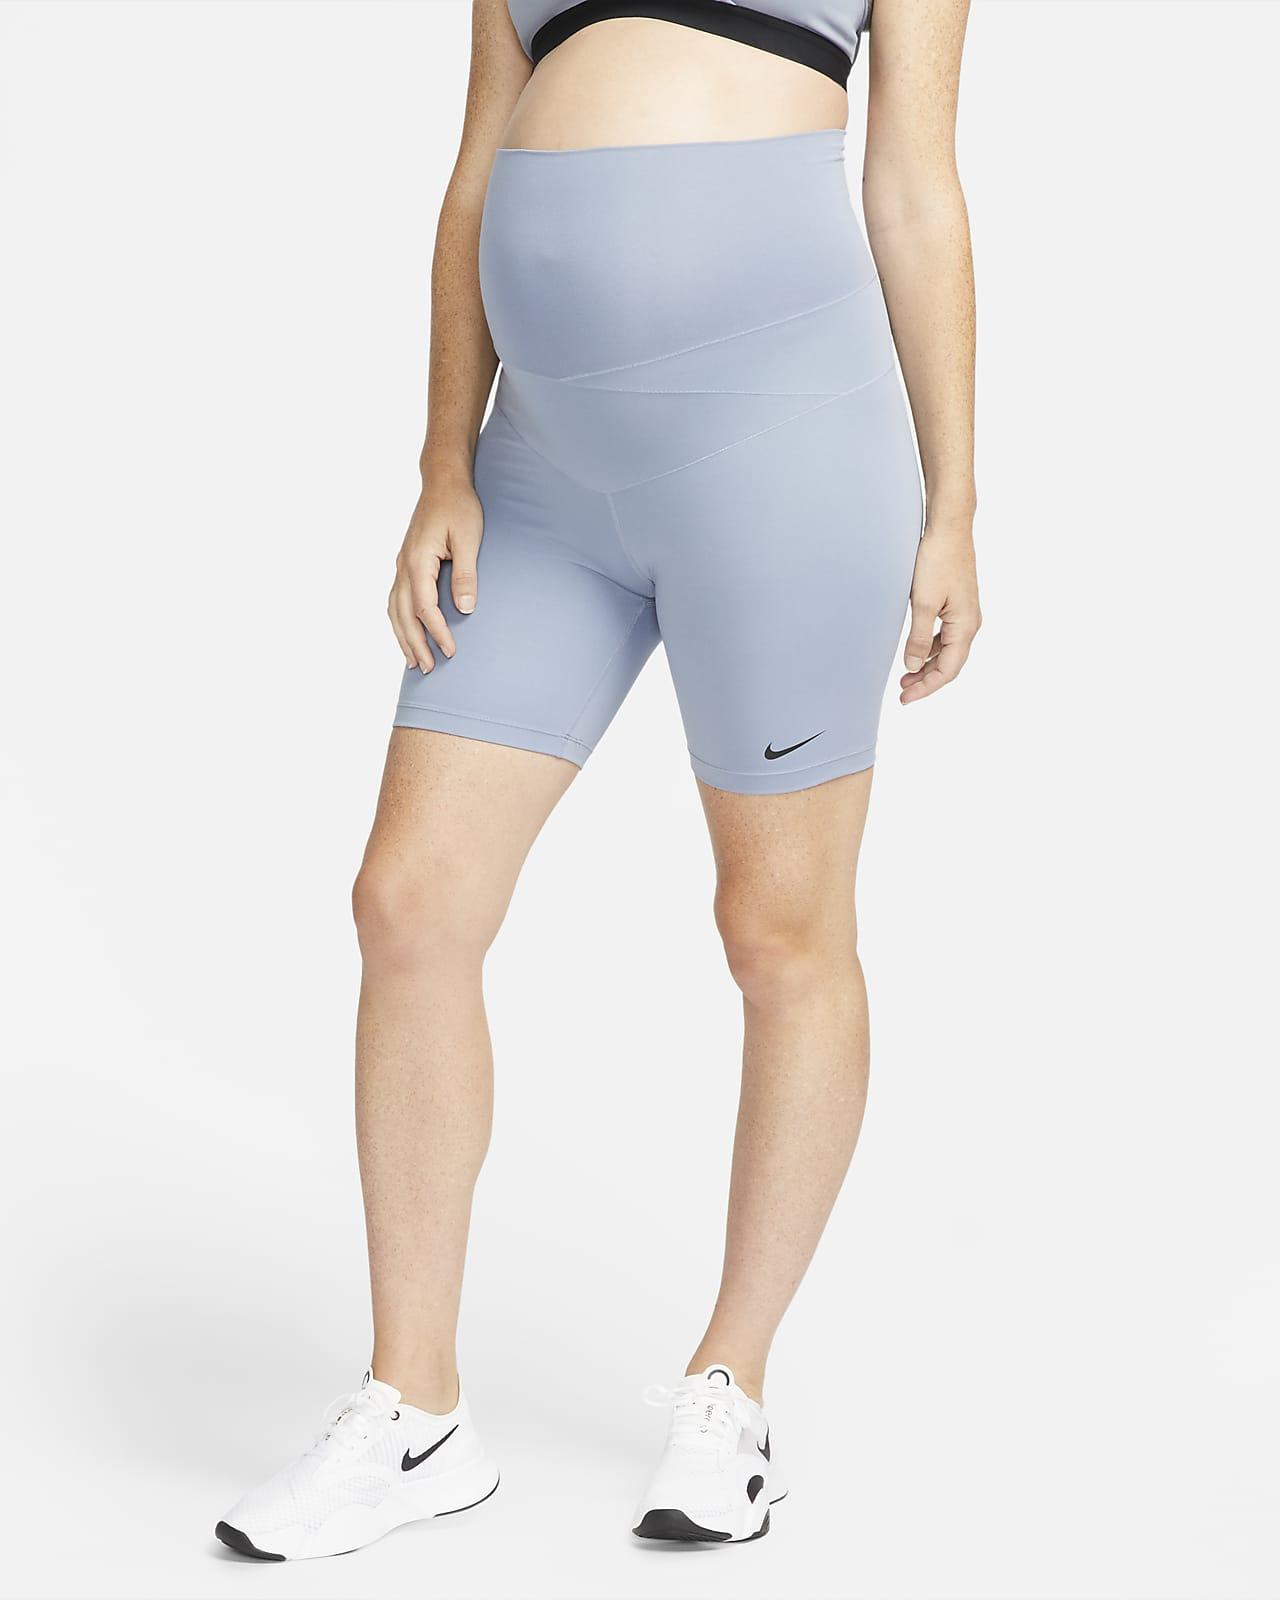 Nike One (M) Dri-FIT Mutterschafts-Shorts für Damen (ca. 18 cm)